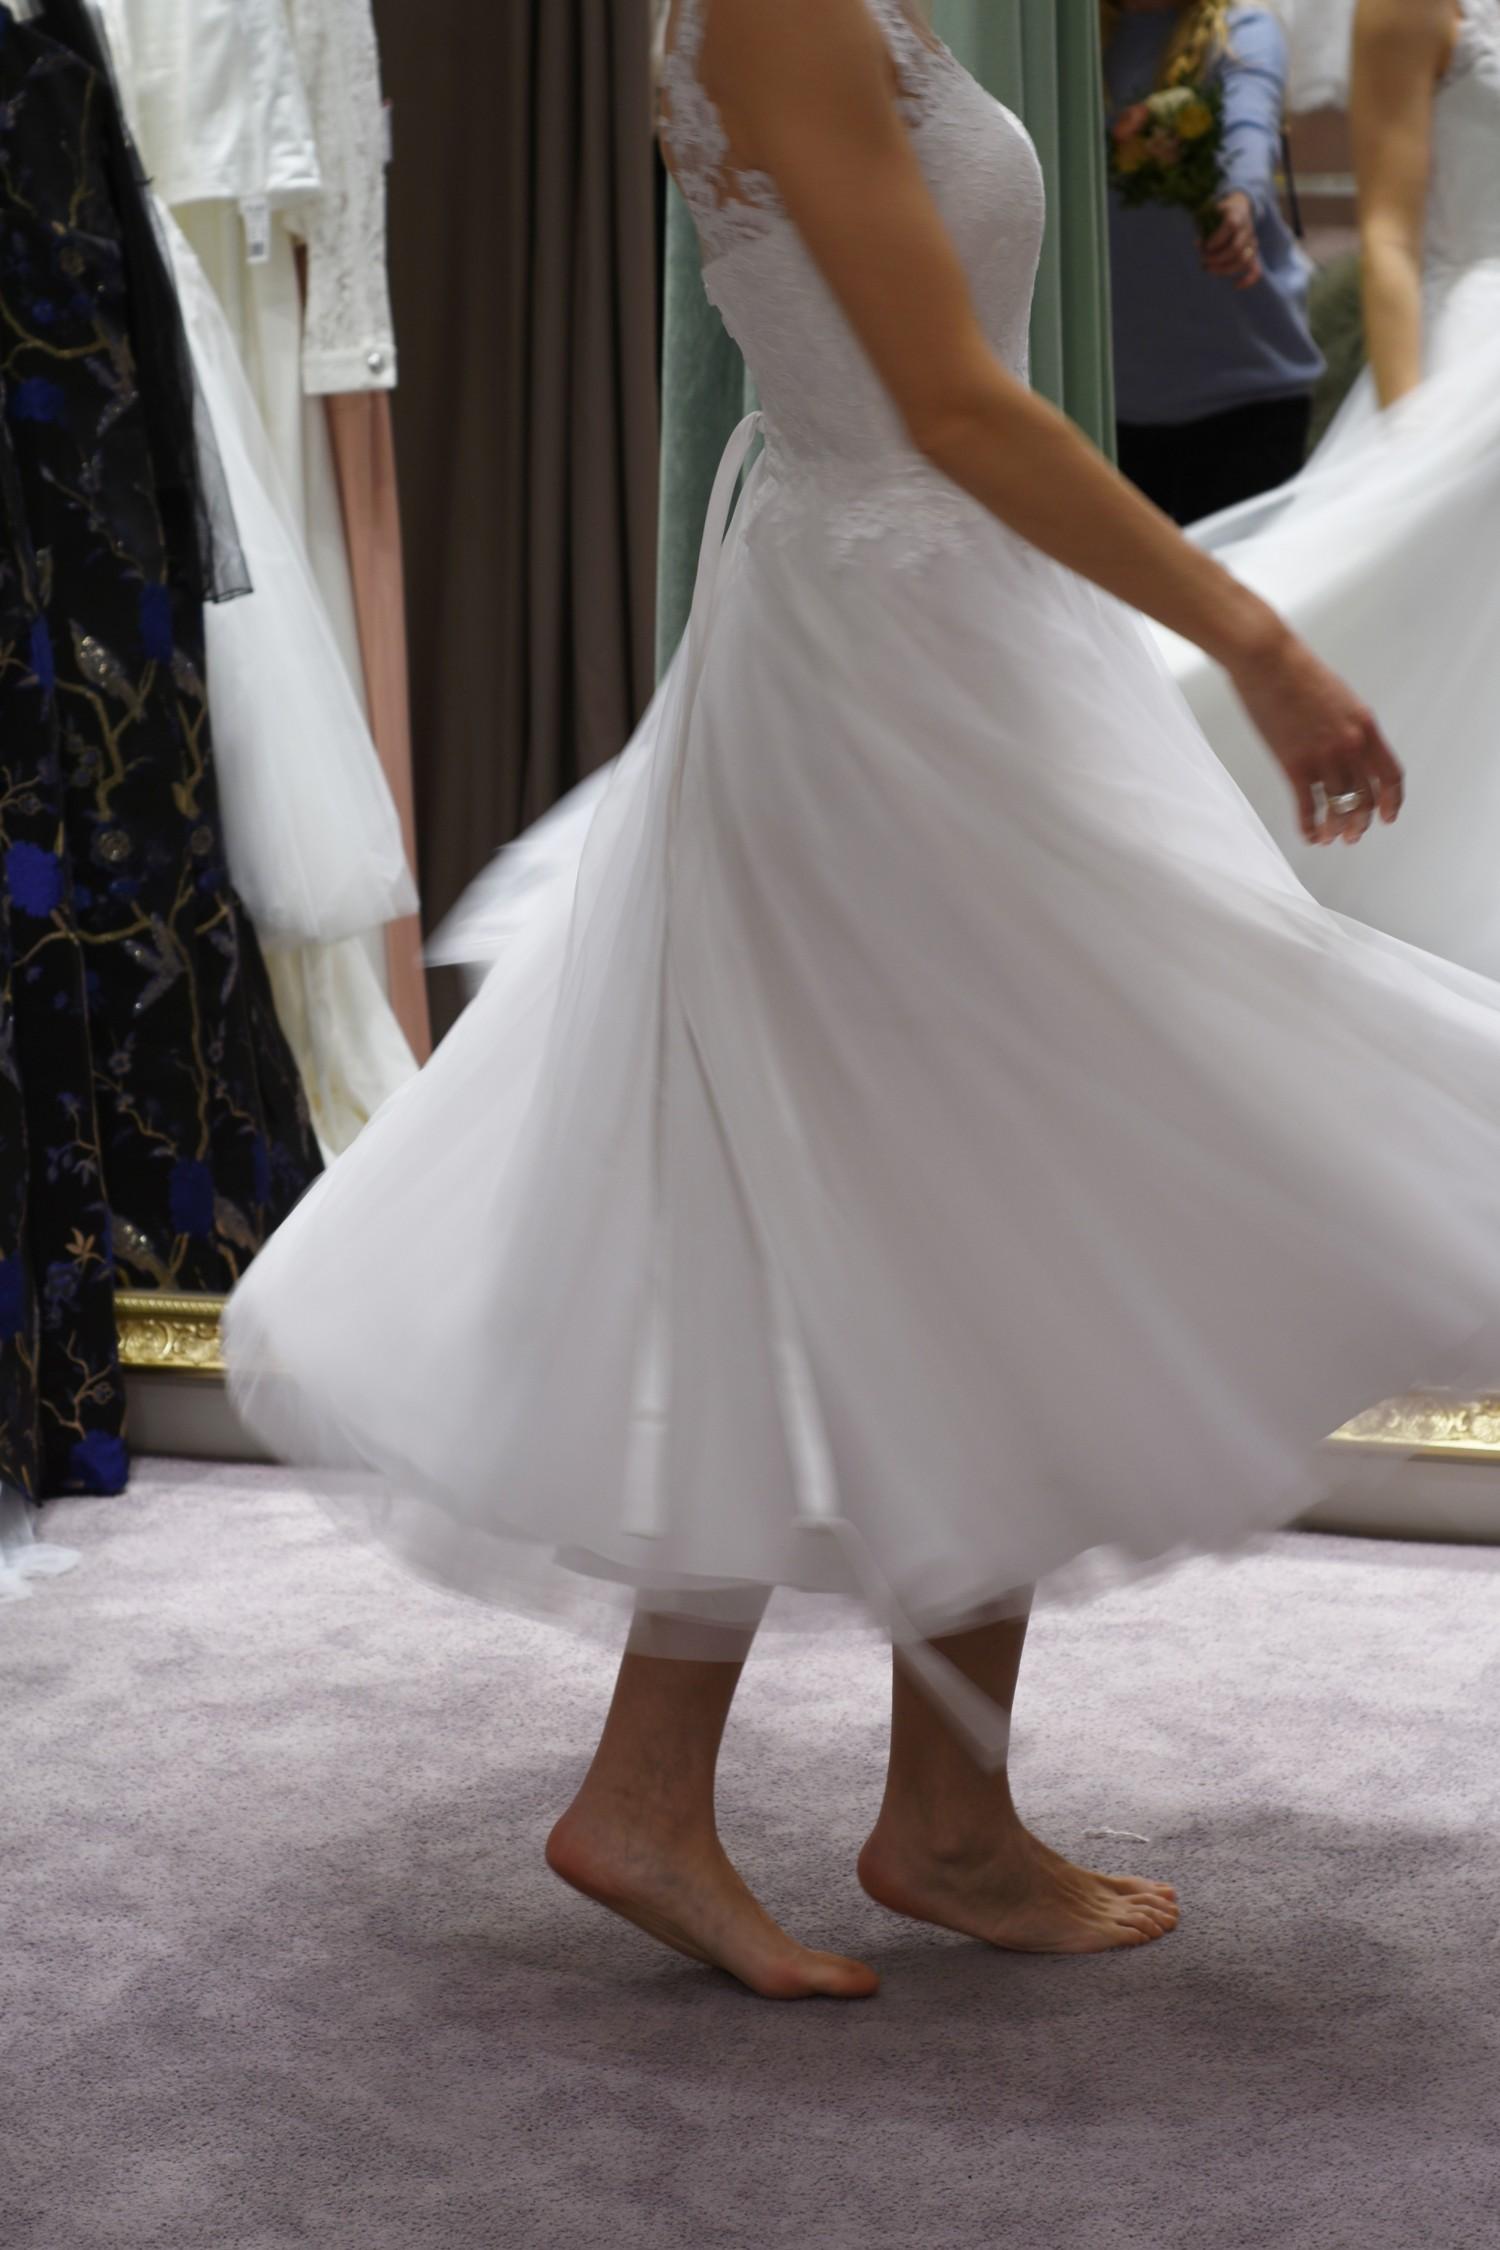 lilly-brudekjoler-annemette-voss-82